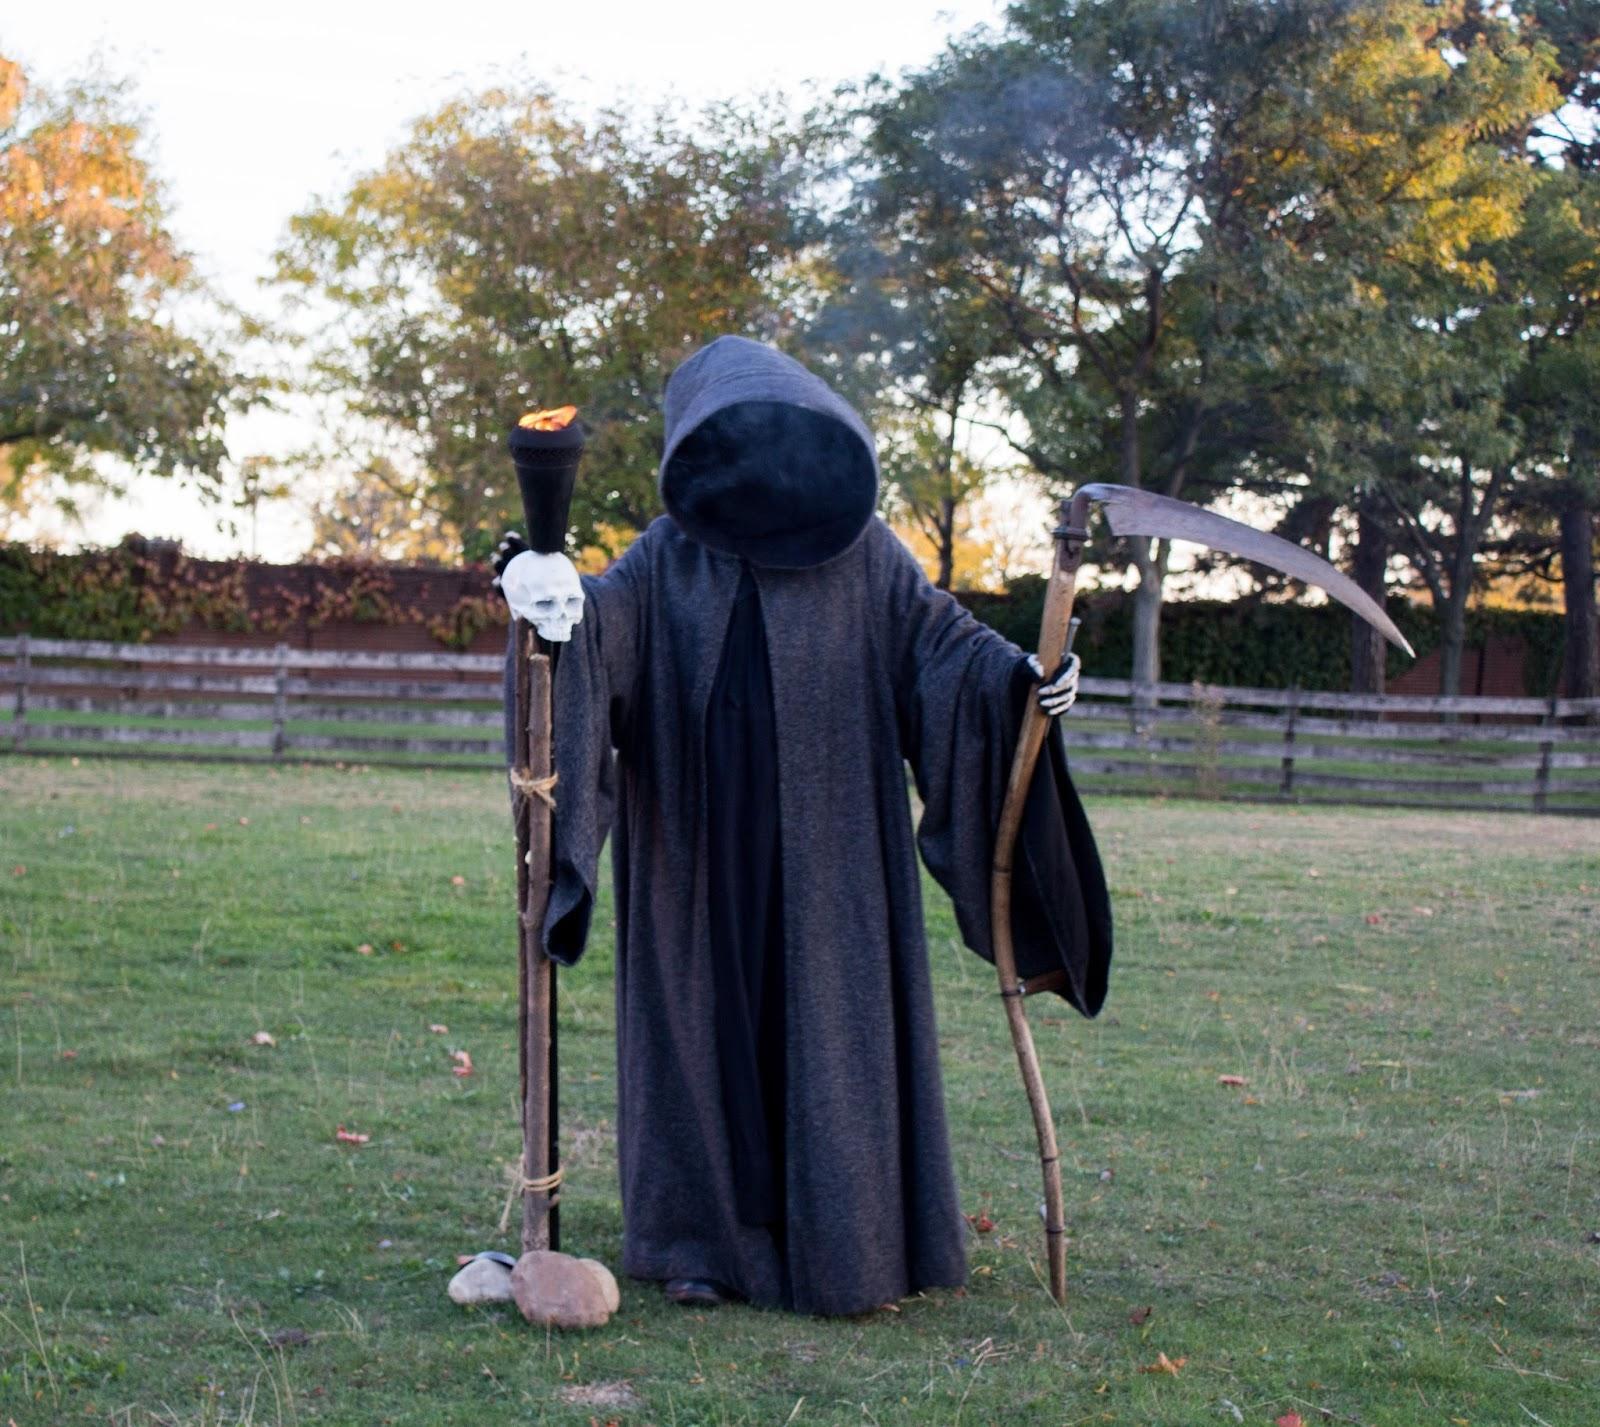 My Life in Retirement: Happy Halloween in Pictures